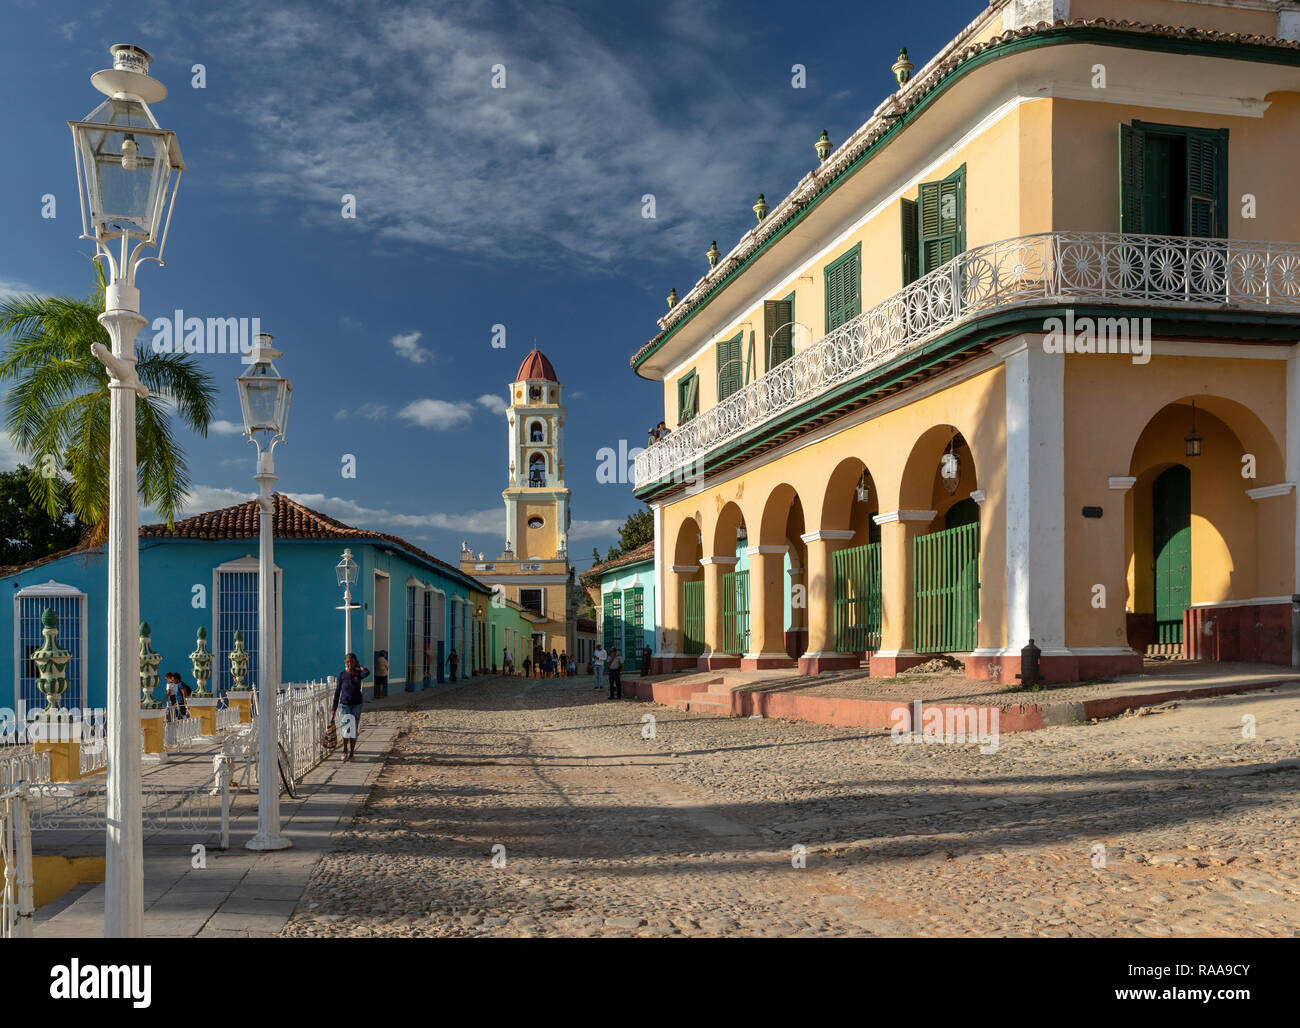 Palacio Brunet and San Francisco tower in late afternoon light at Plaza Mayor, Trinidad, Cuba - Stock Image